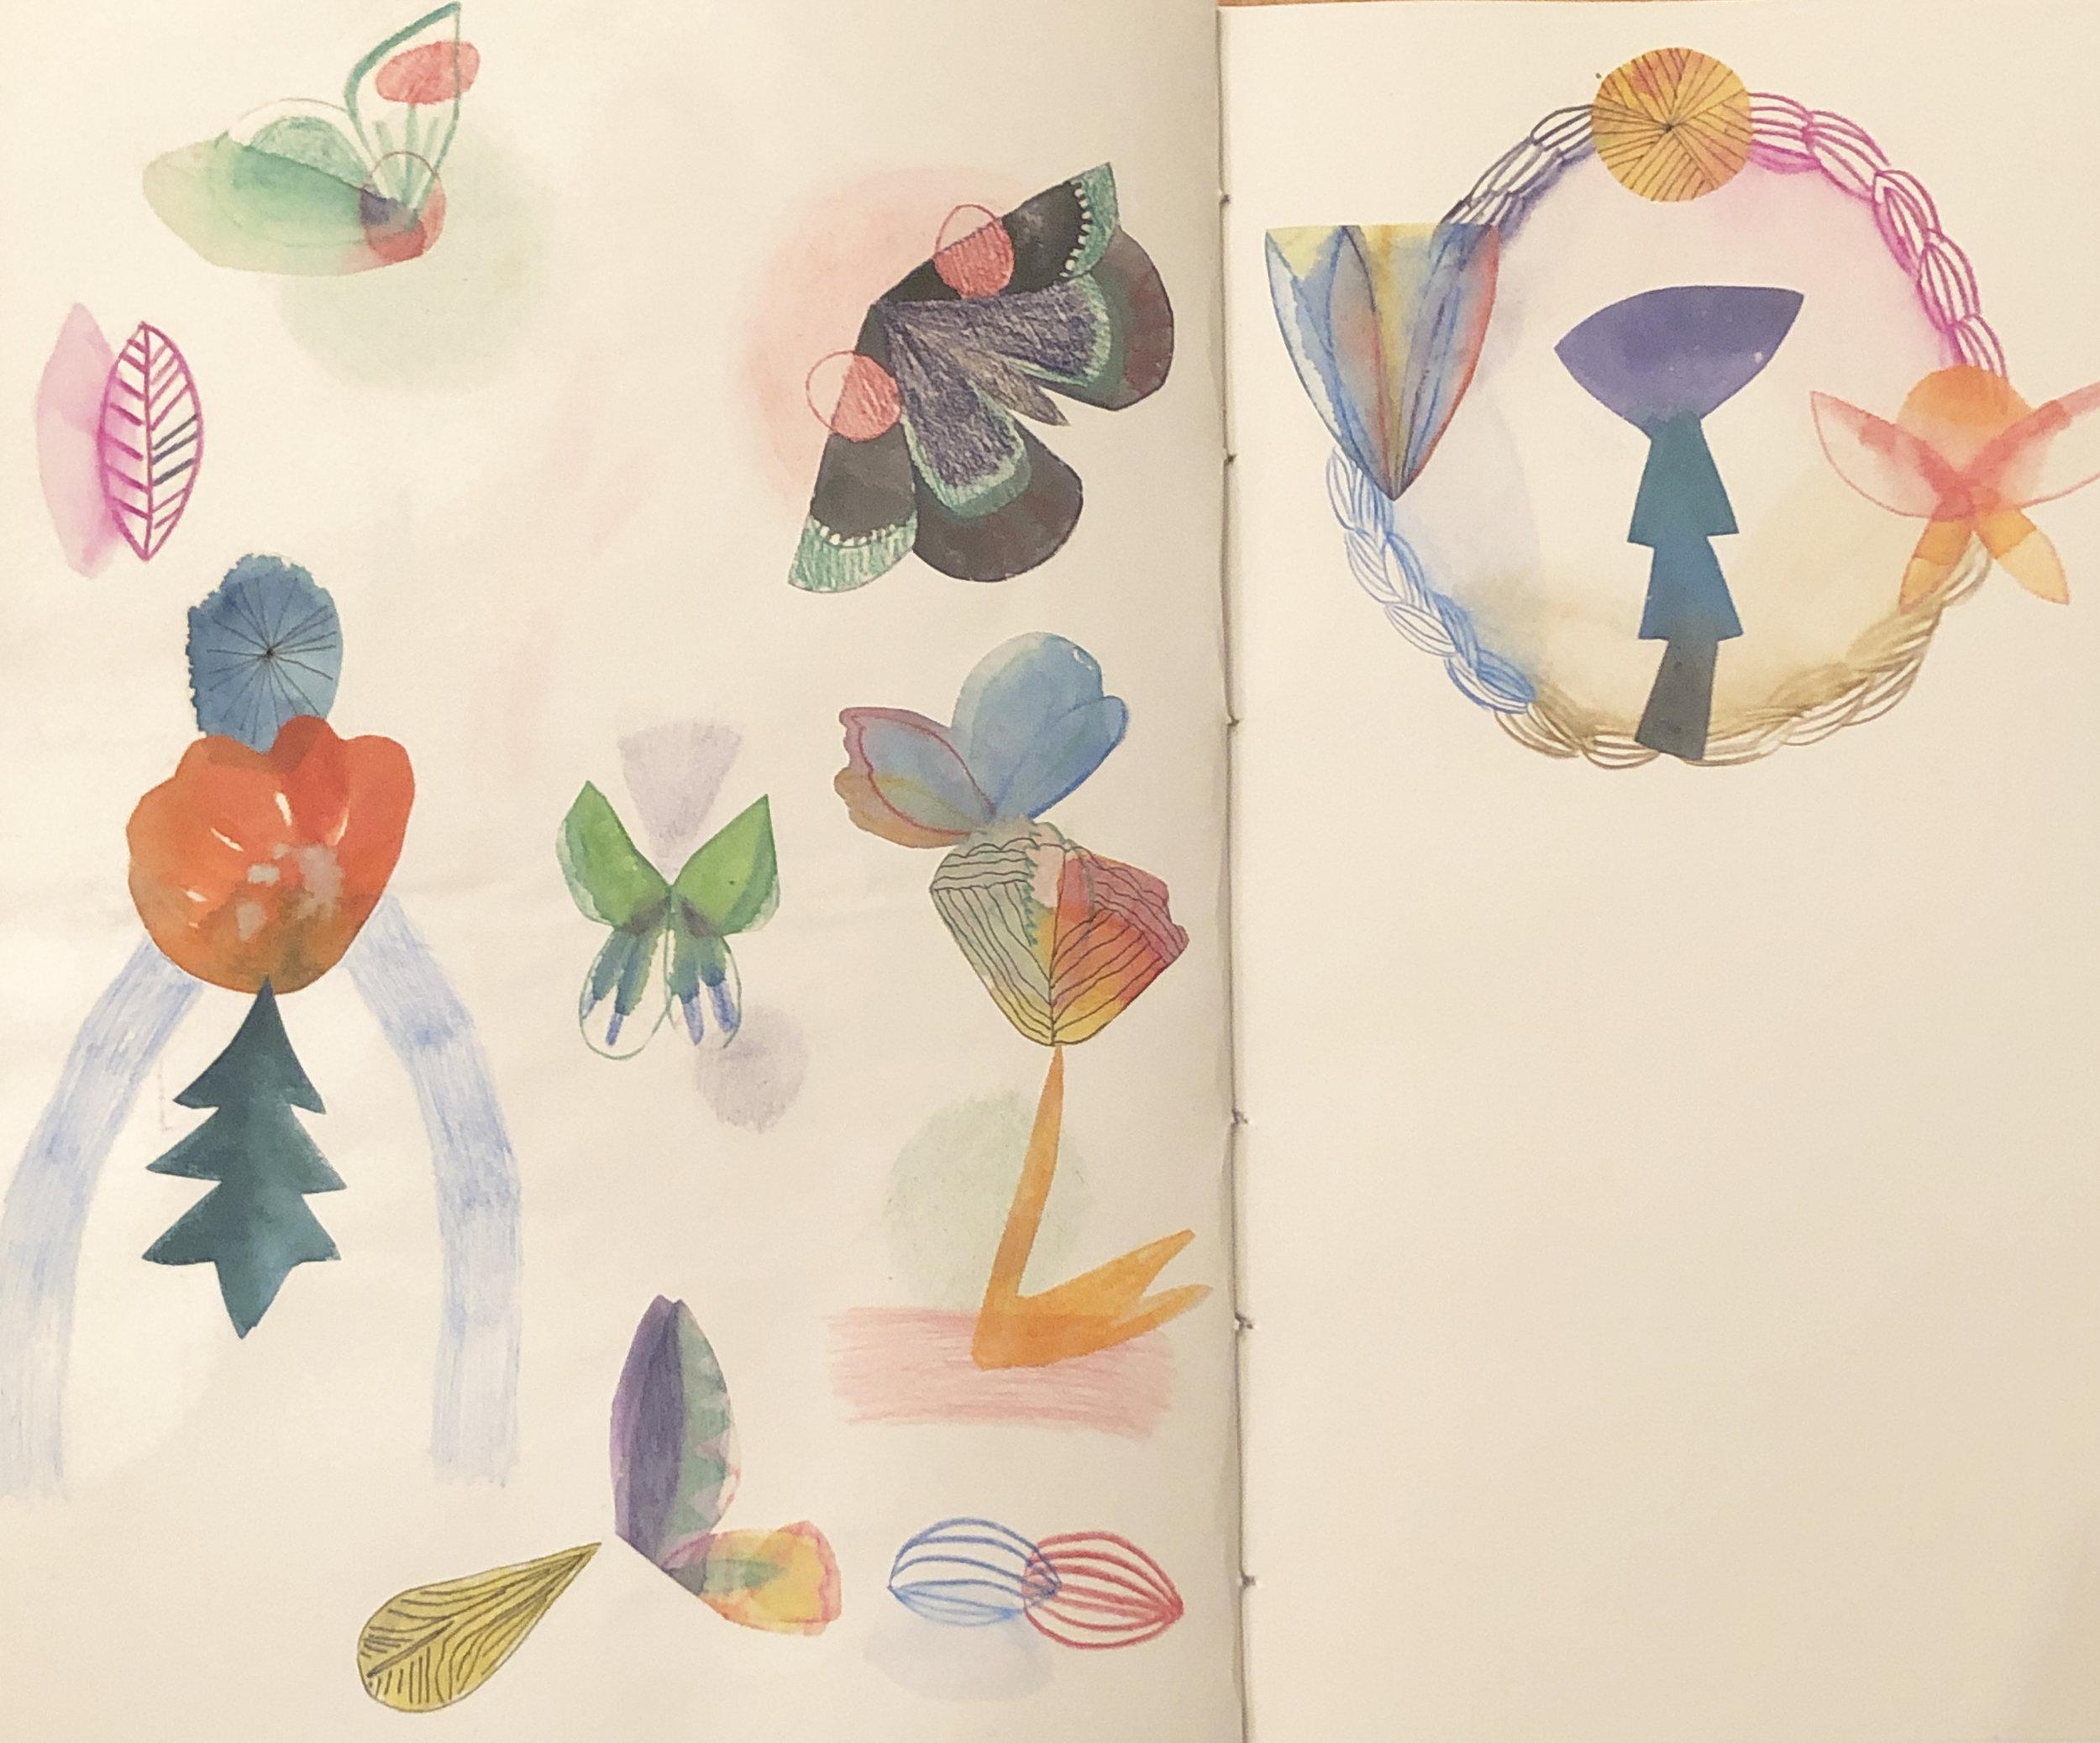 entry for Daftar Asfar Albuquerque edition, 2019, watercolor, coiored pencil and collage in sketchbook